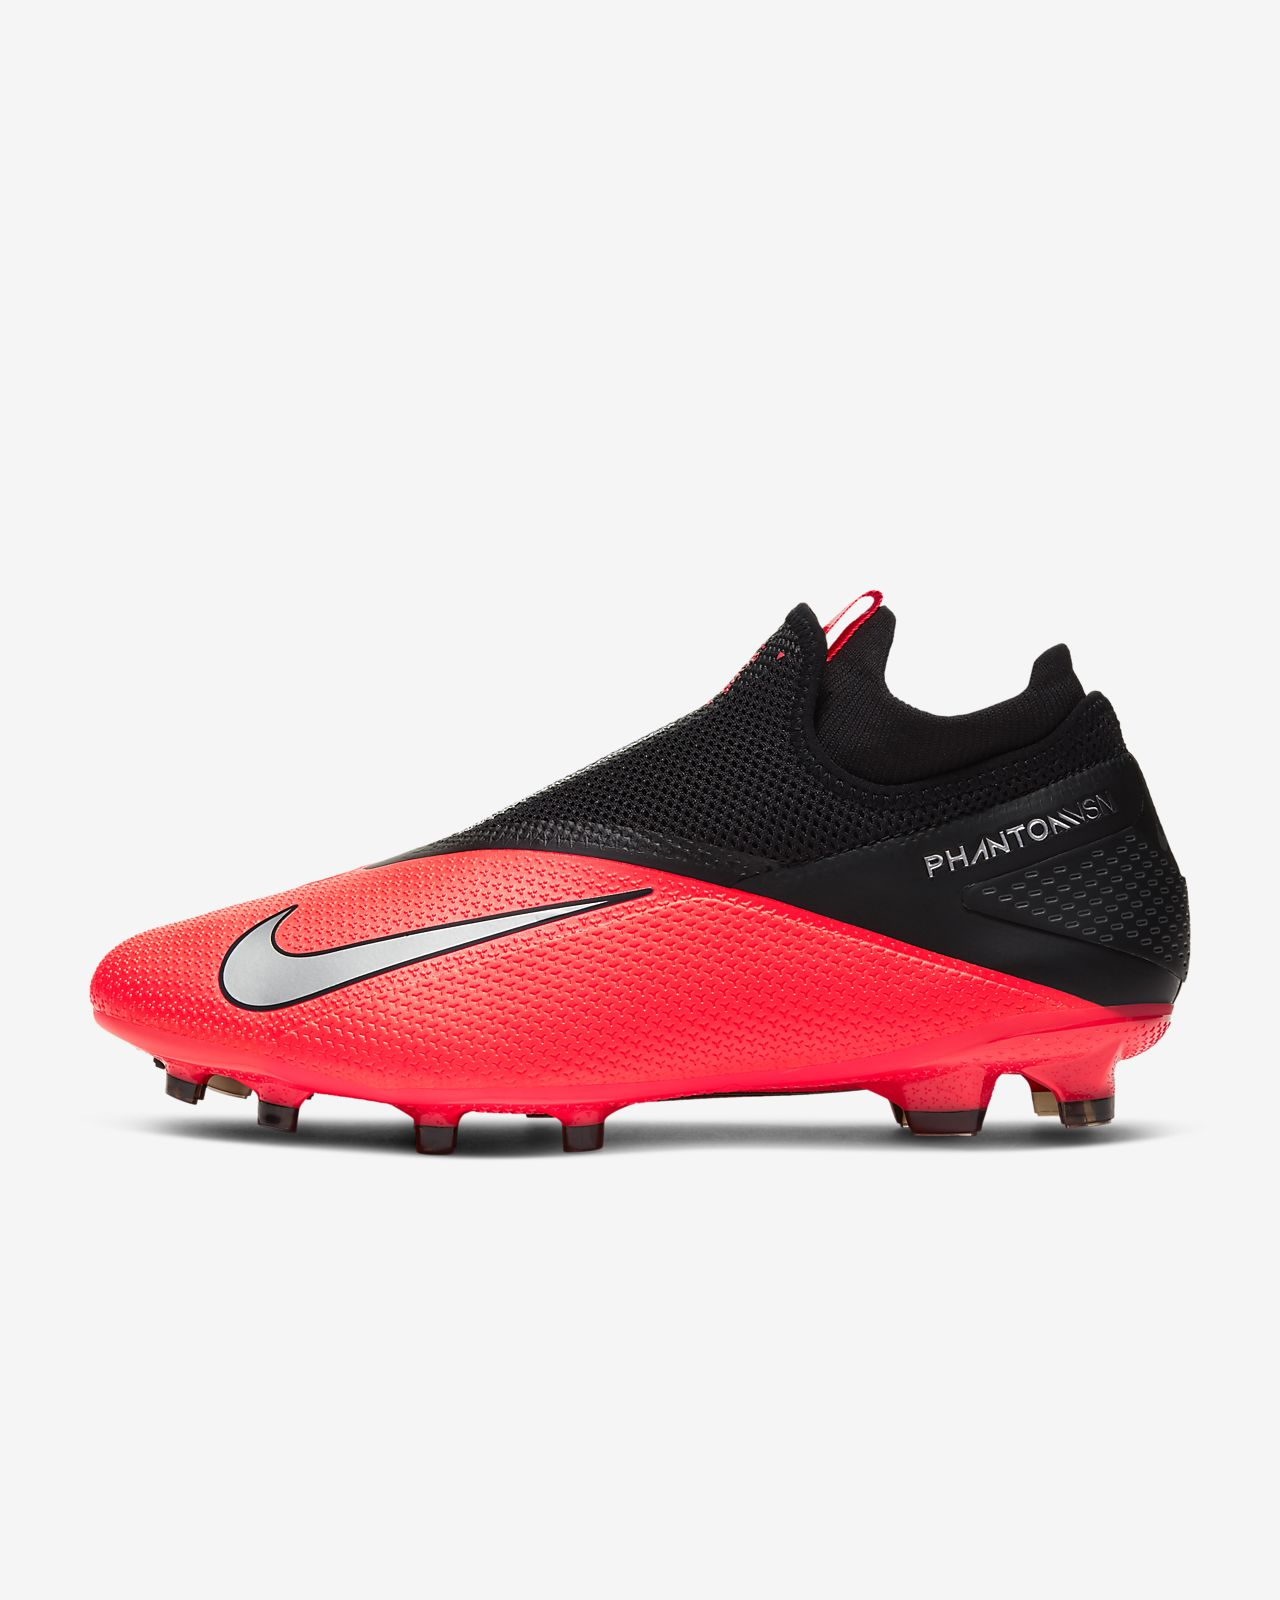 Chaussure de football à crampons pour terrain sec Nike Phantom Vision 2 Pro Dynamic Fit FG